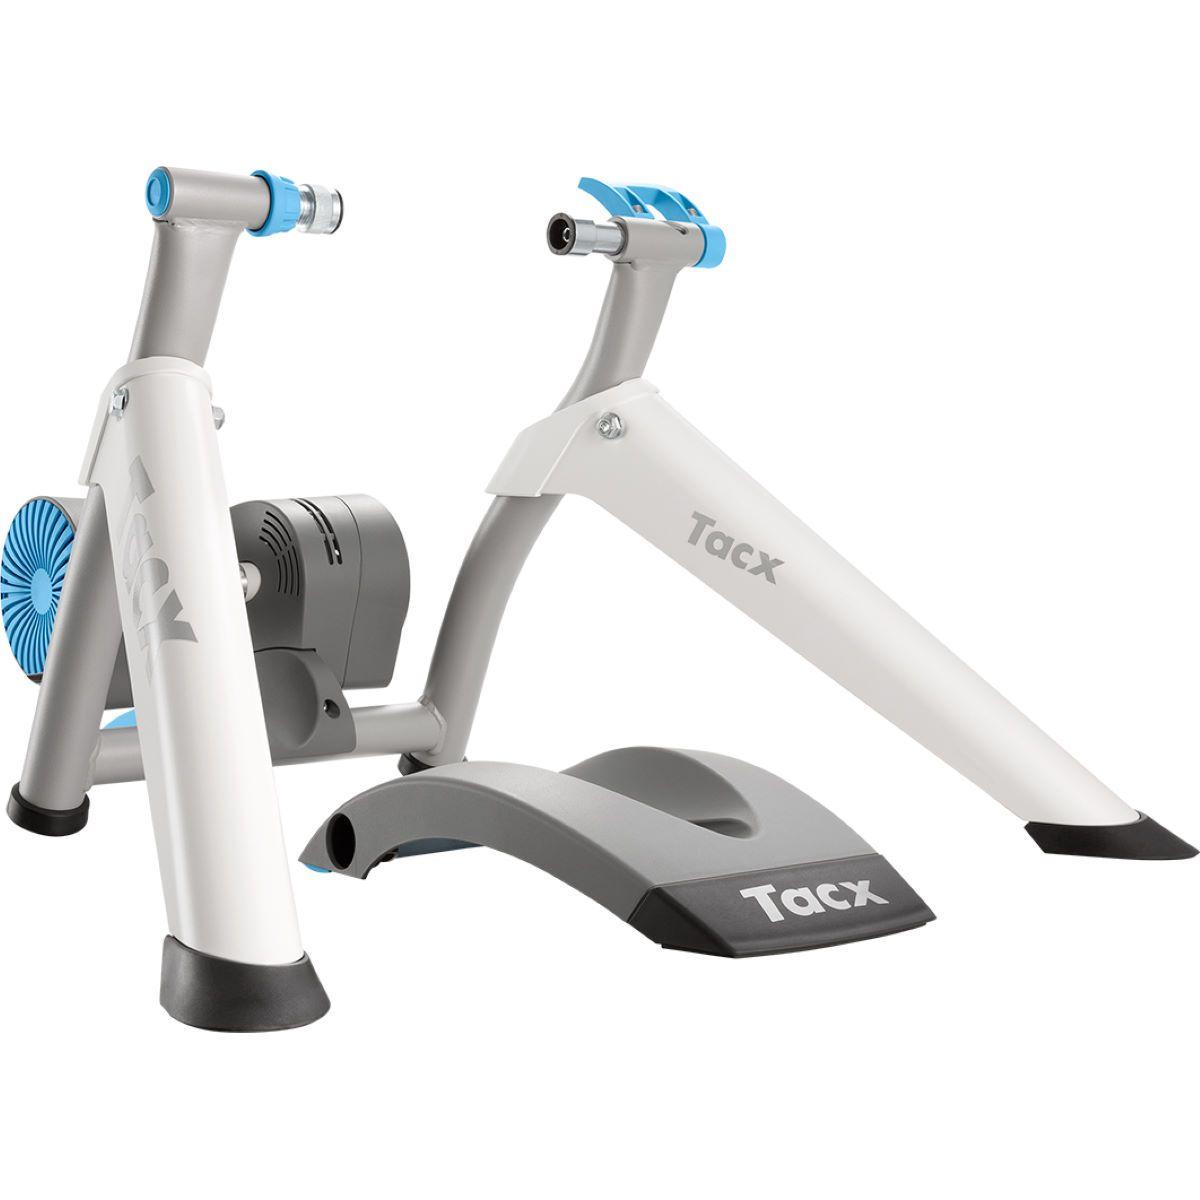 Tacx Vortex Smart Trainer Turbo Trainers Cyclingbargains Bike